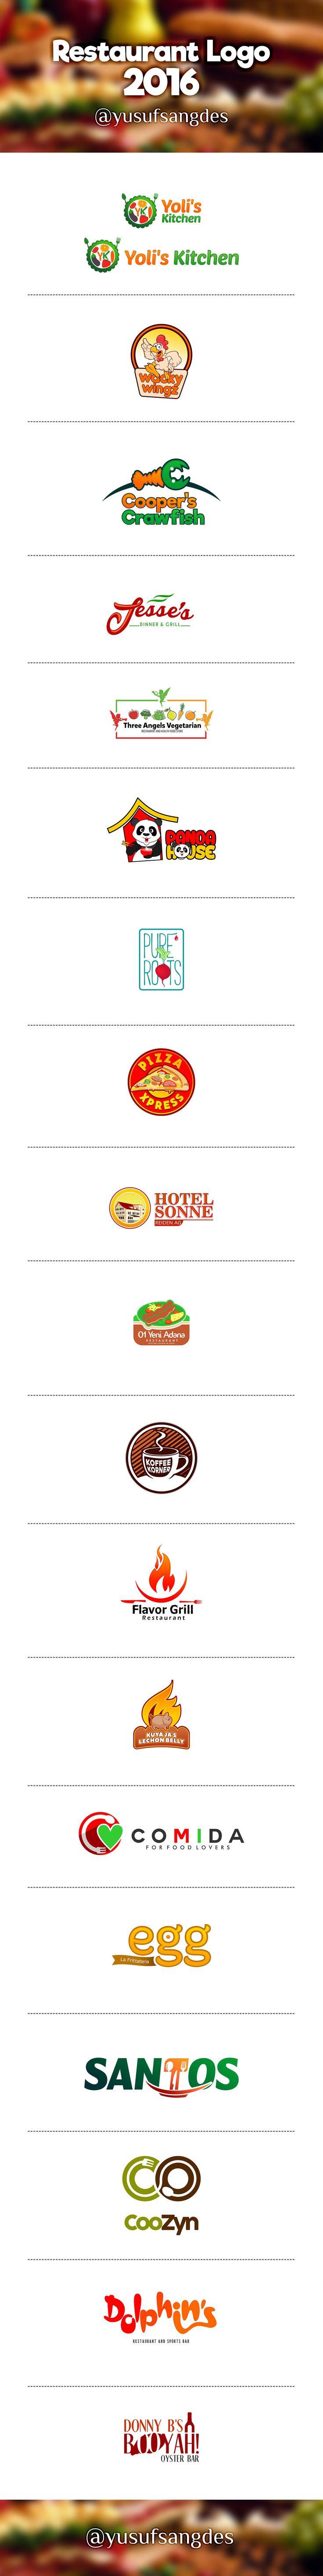 Behance :: Editing Restaurant Logo 2016 (January- May)